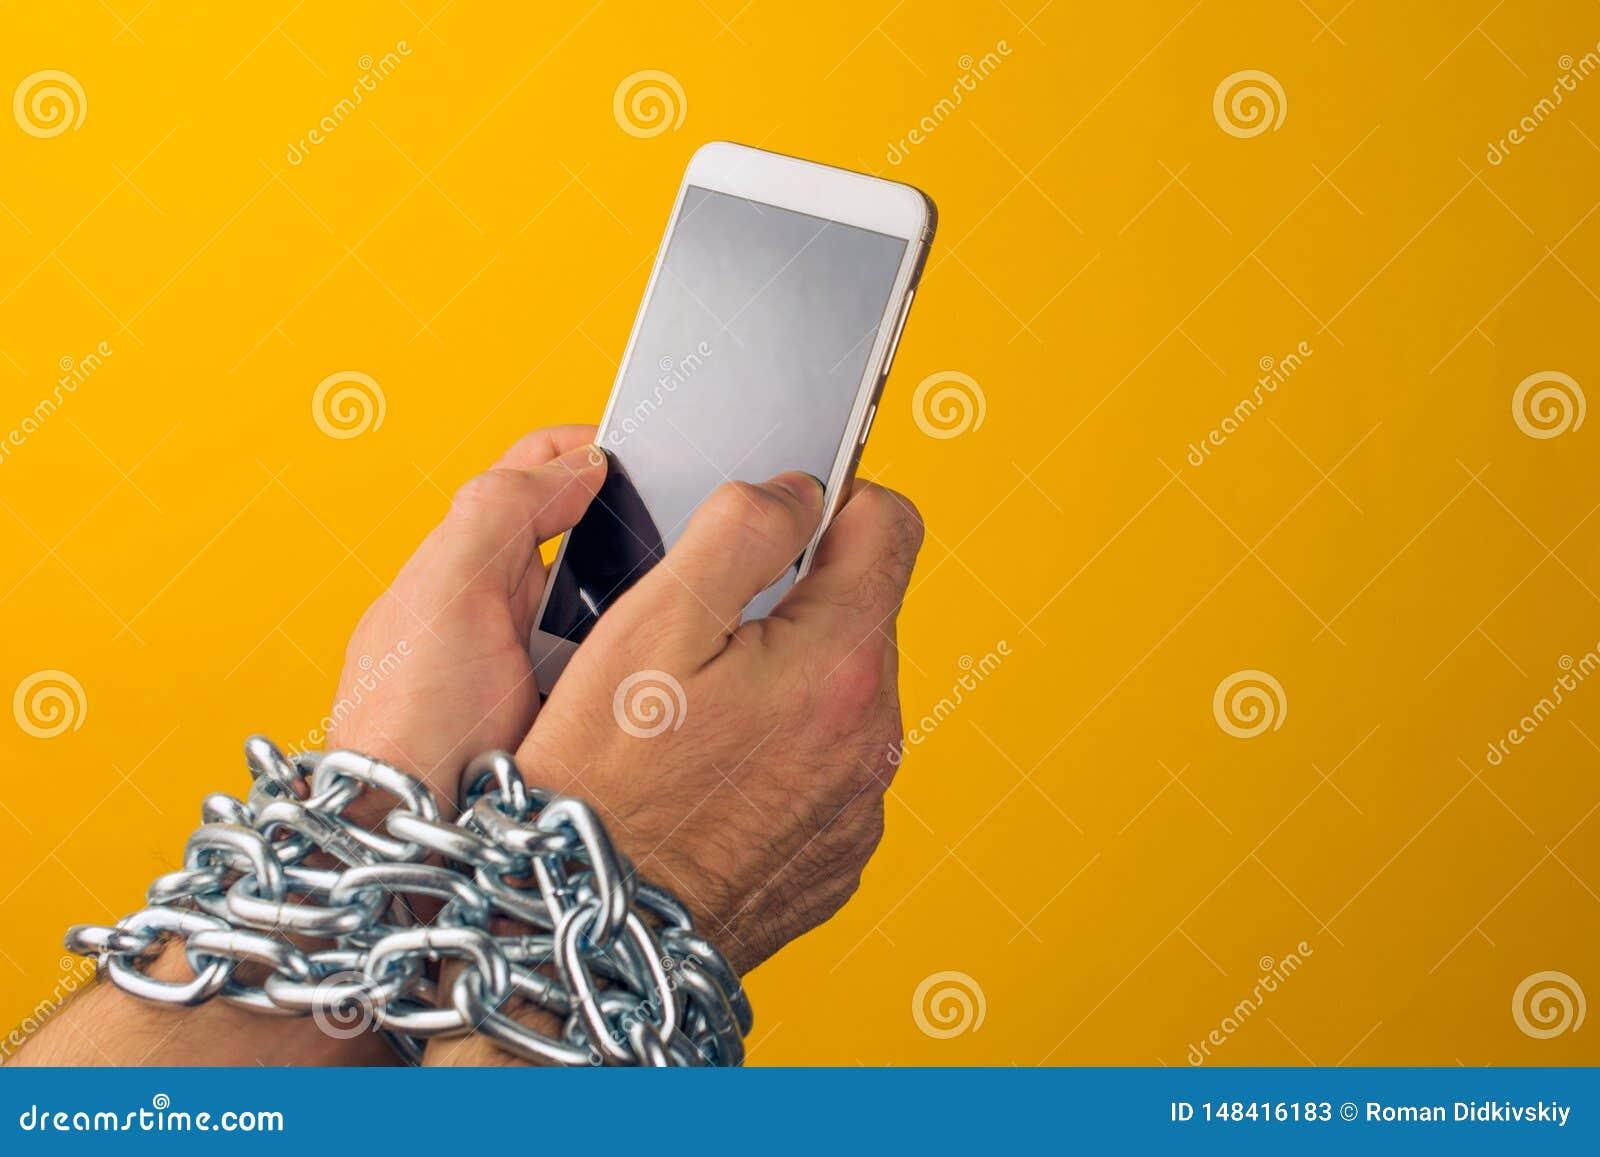 Internet or social media addiction